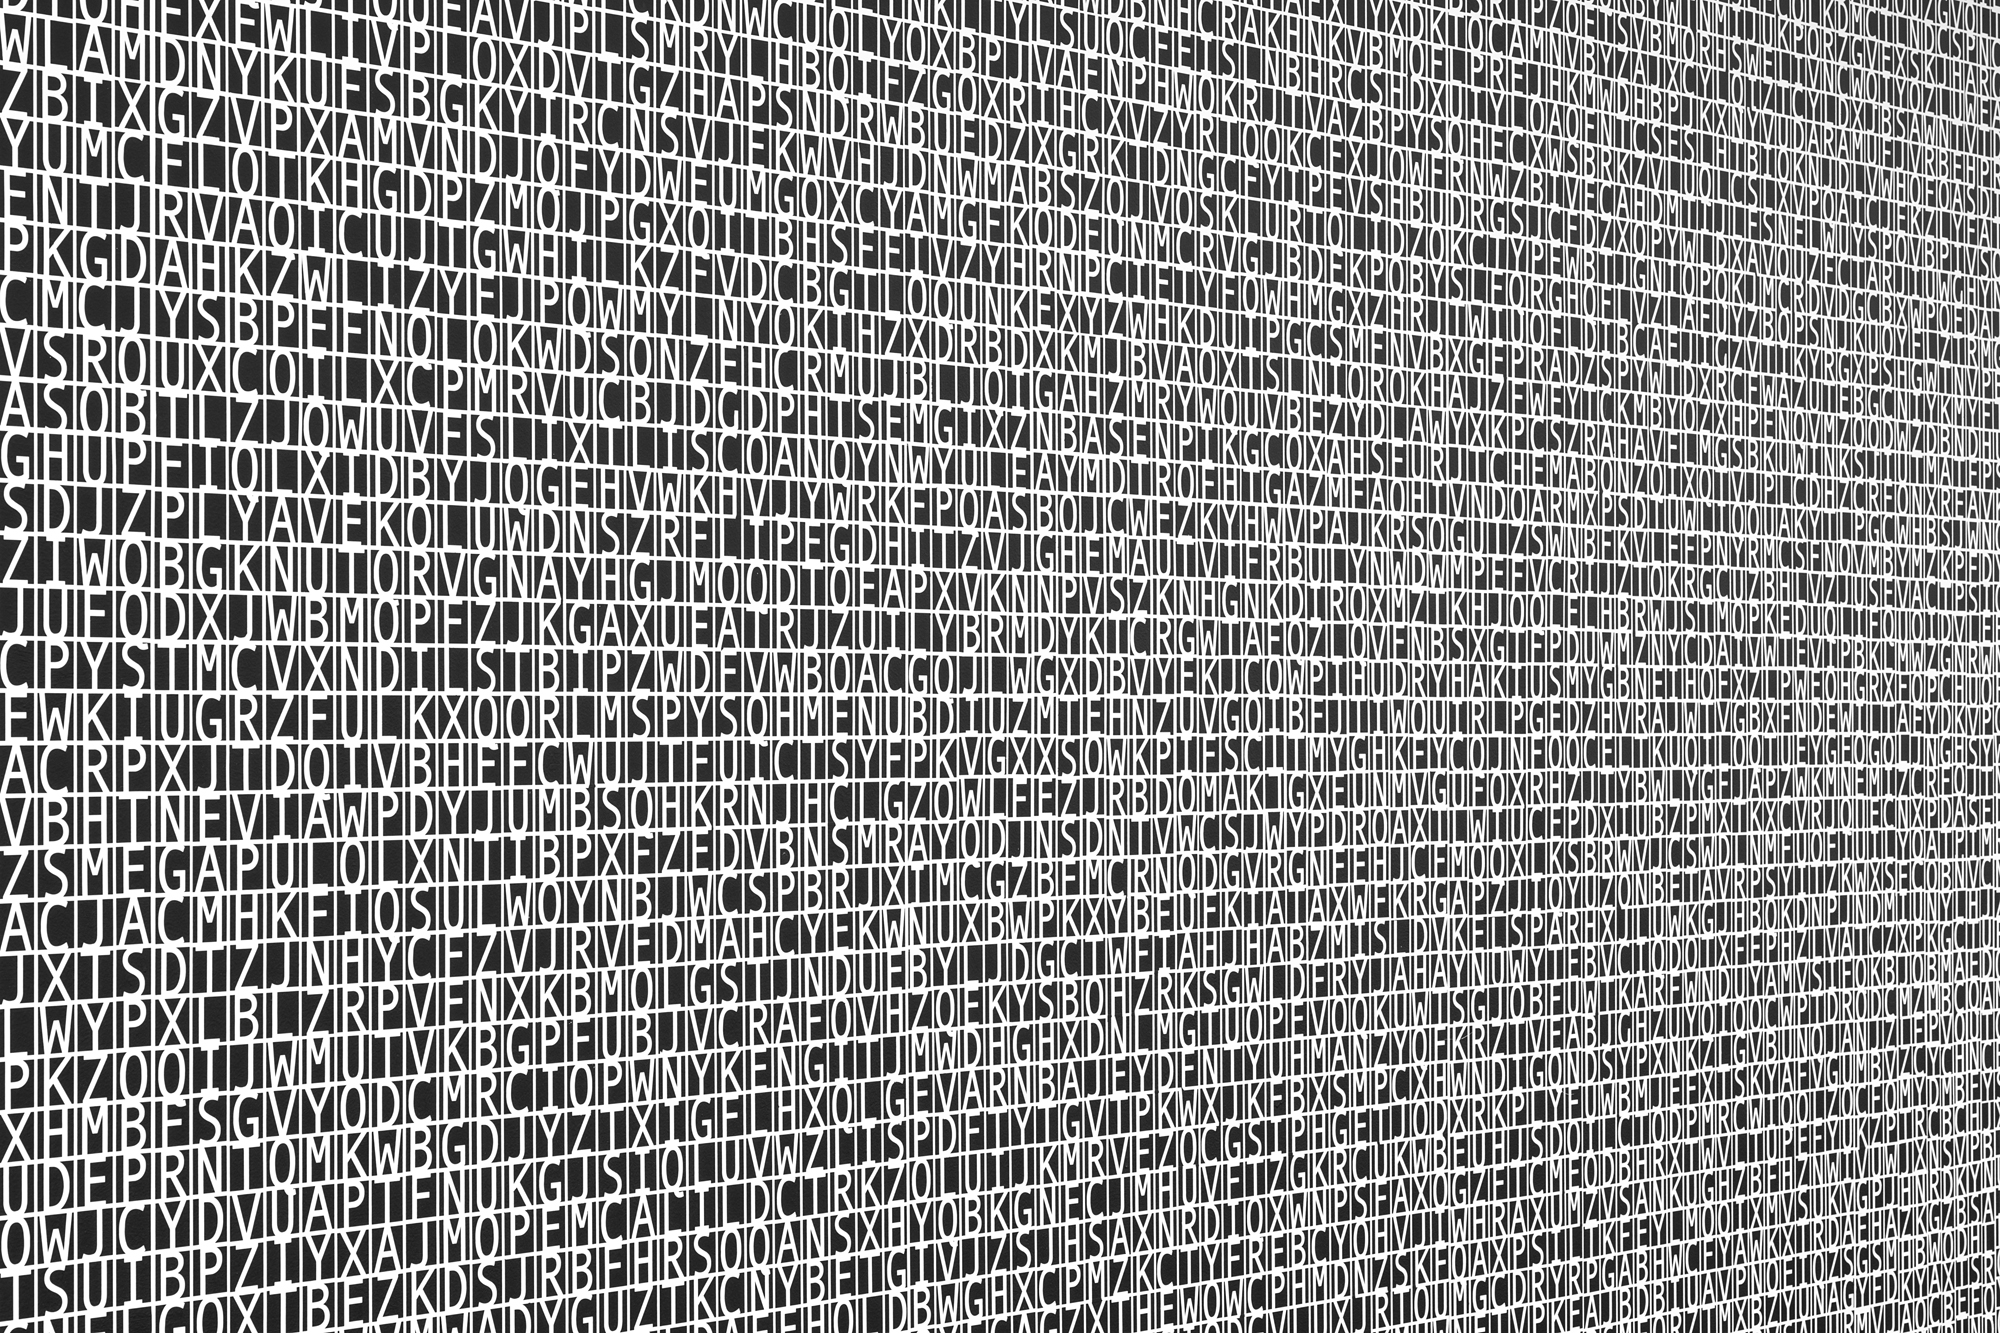 Lenguaje desmantelado (Marfa) / Dismantled Language (Marfa),  2017  Pintura sobre muro / Paint on Wall  335 x 1788 cm